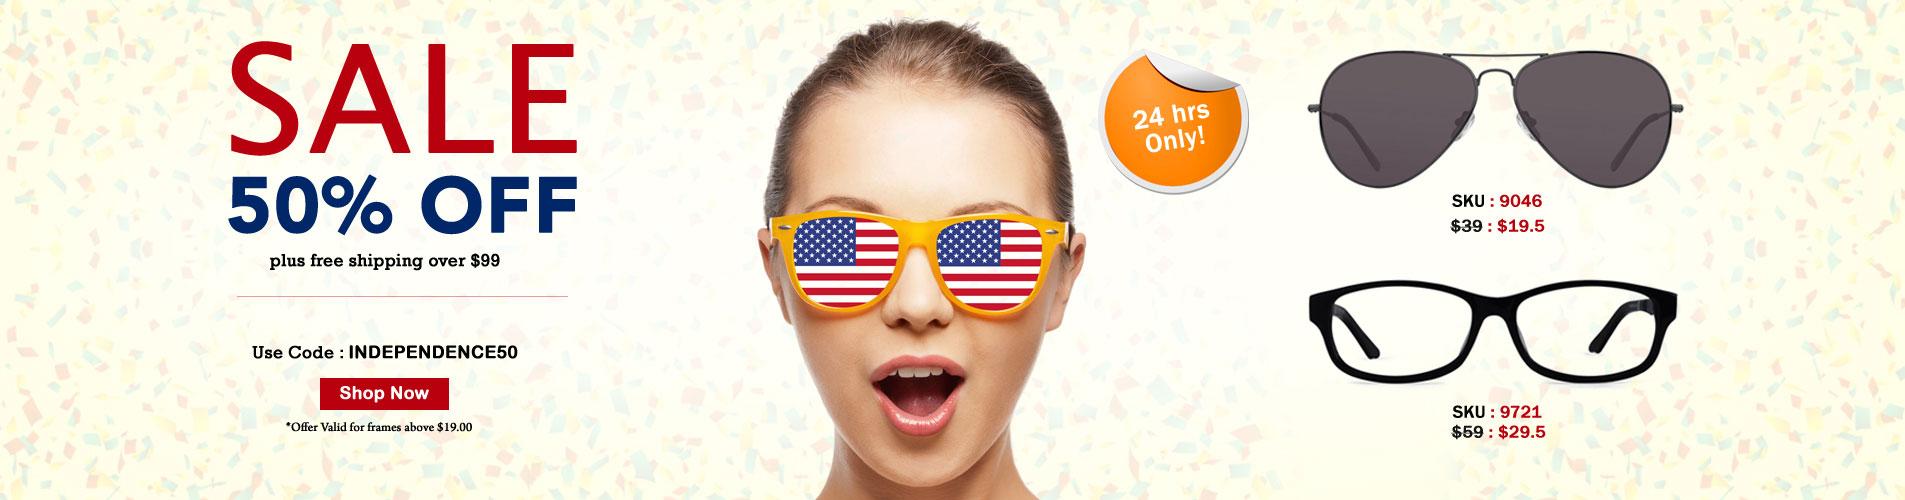 50% Off Independence Day offer on Prescription Glasses